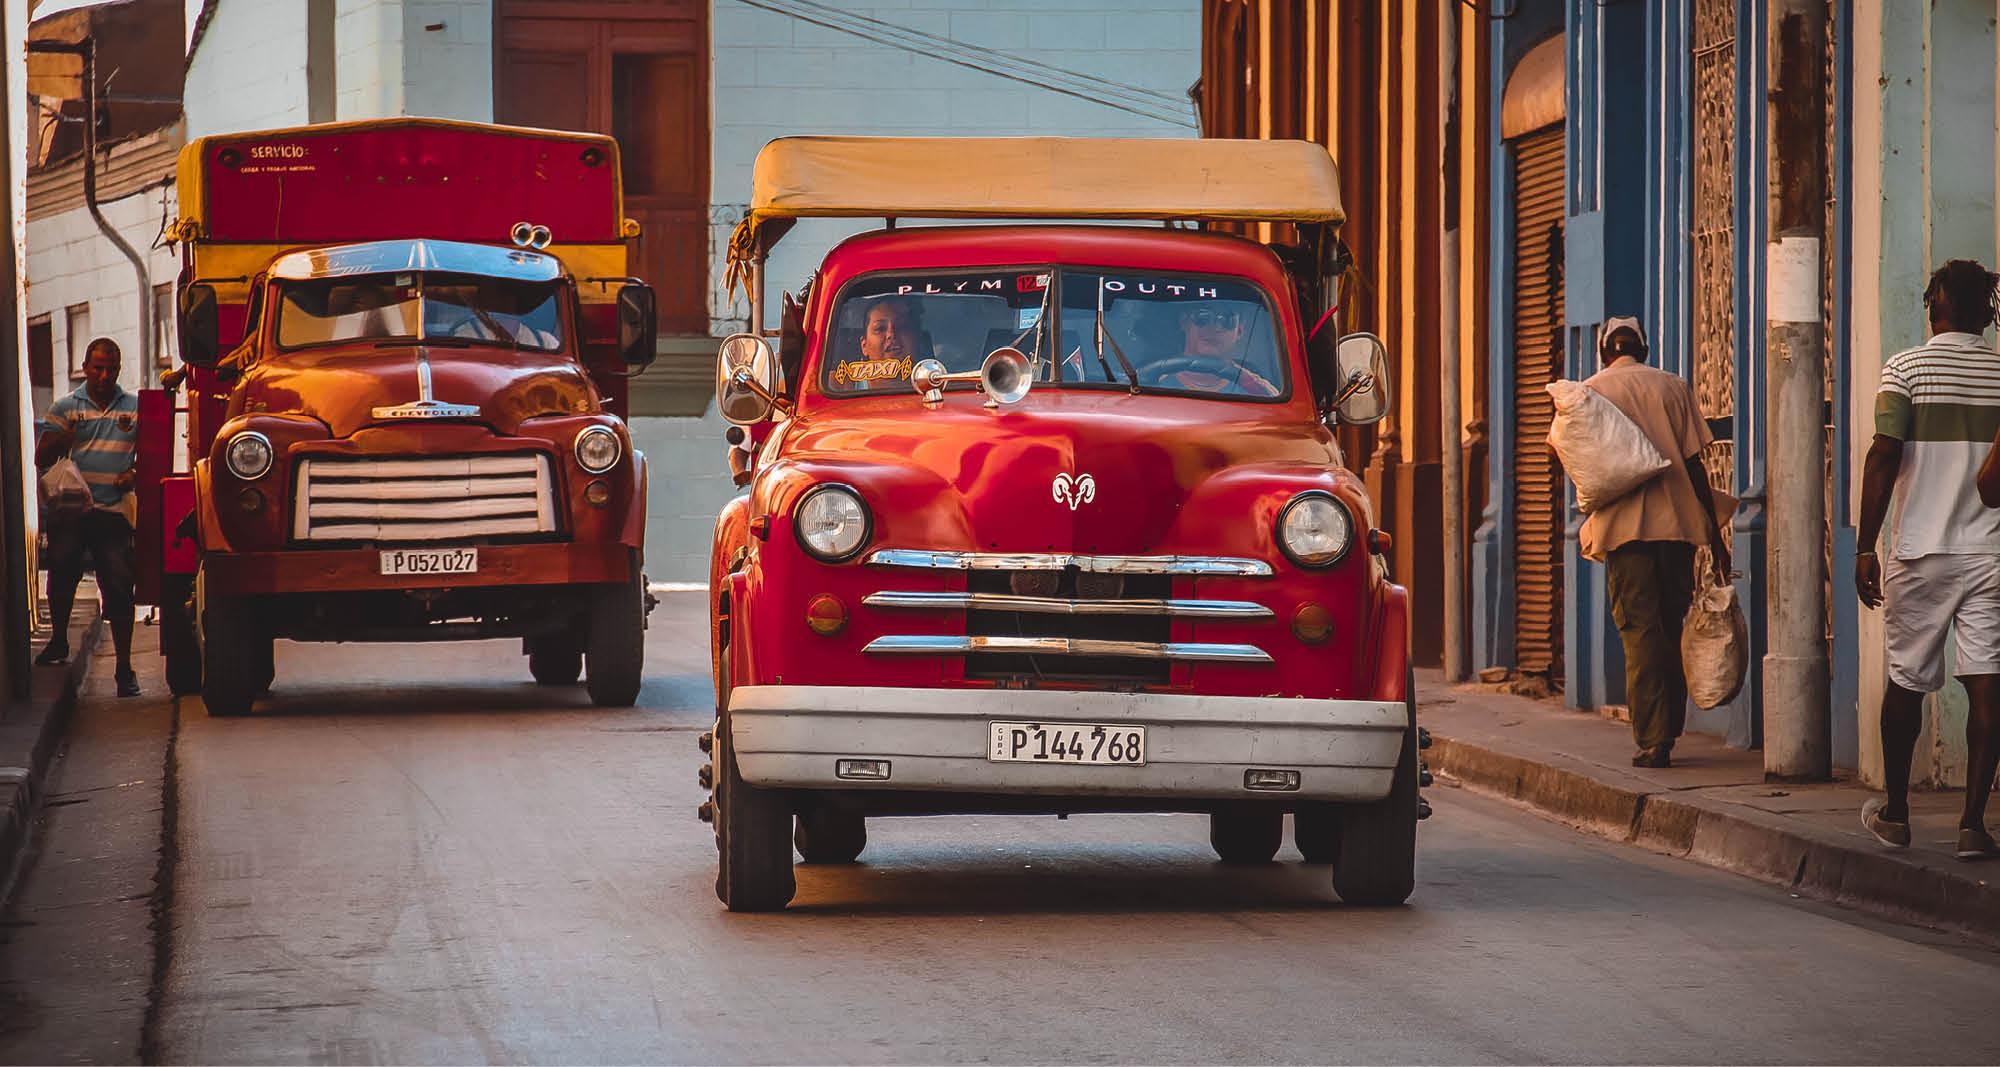 Dream-Maker-Travel-Panama-Santiago.jpg